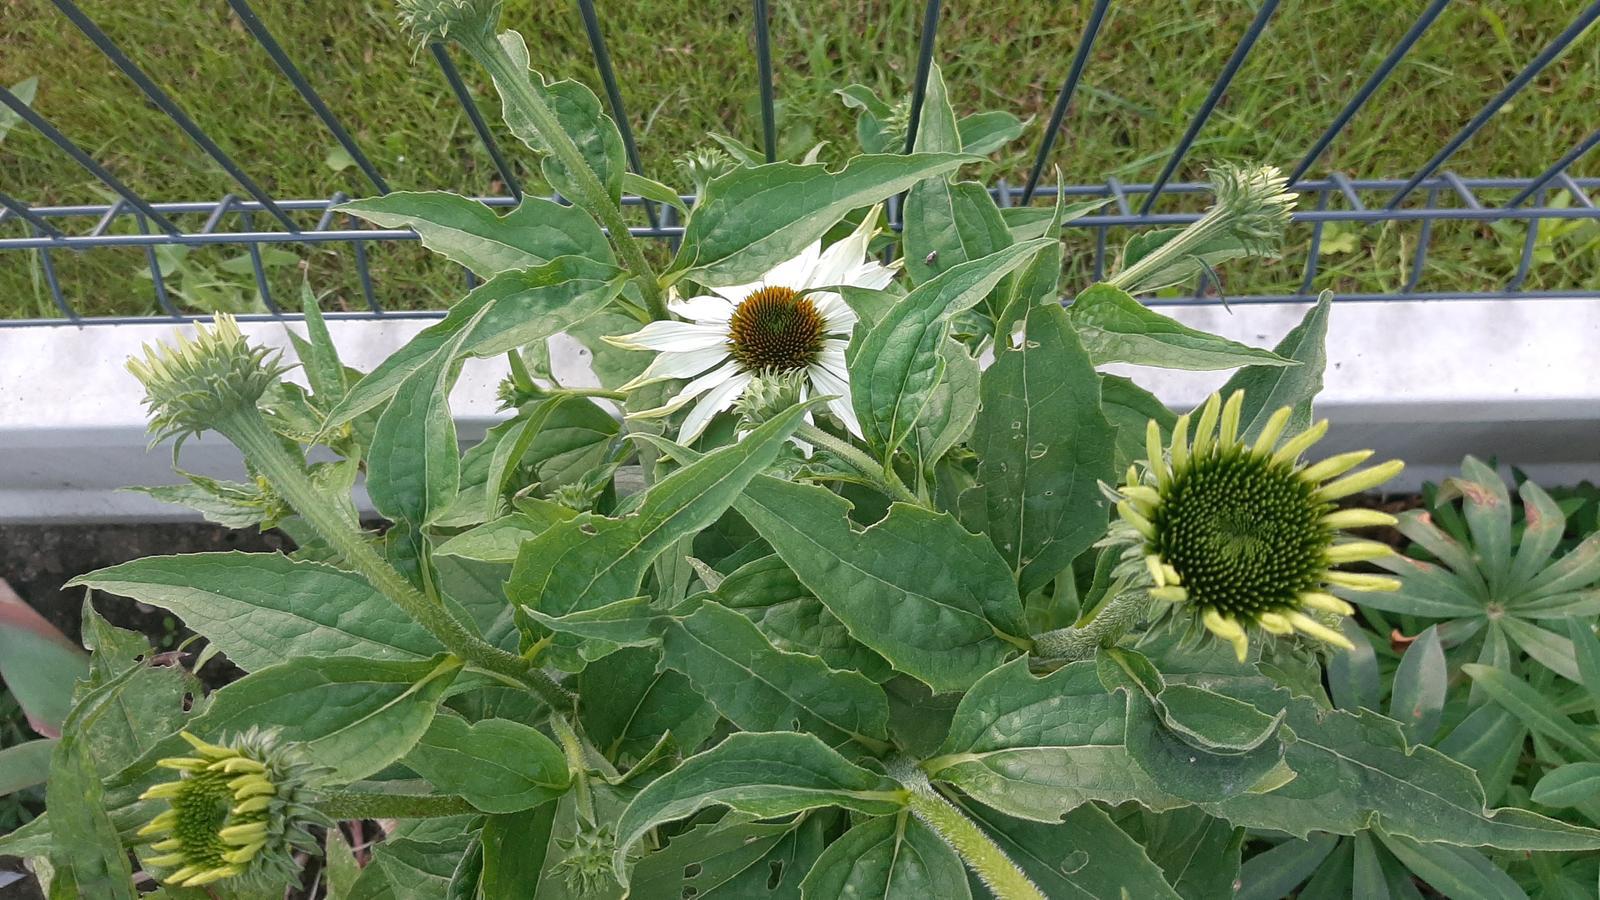 🏠🌞🌺❤🌷 Zahrada a jej dalsi rok...2020 🌱🐞🐛🦋🍓🥕🍅🌺❤ - Echinacea.